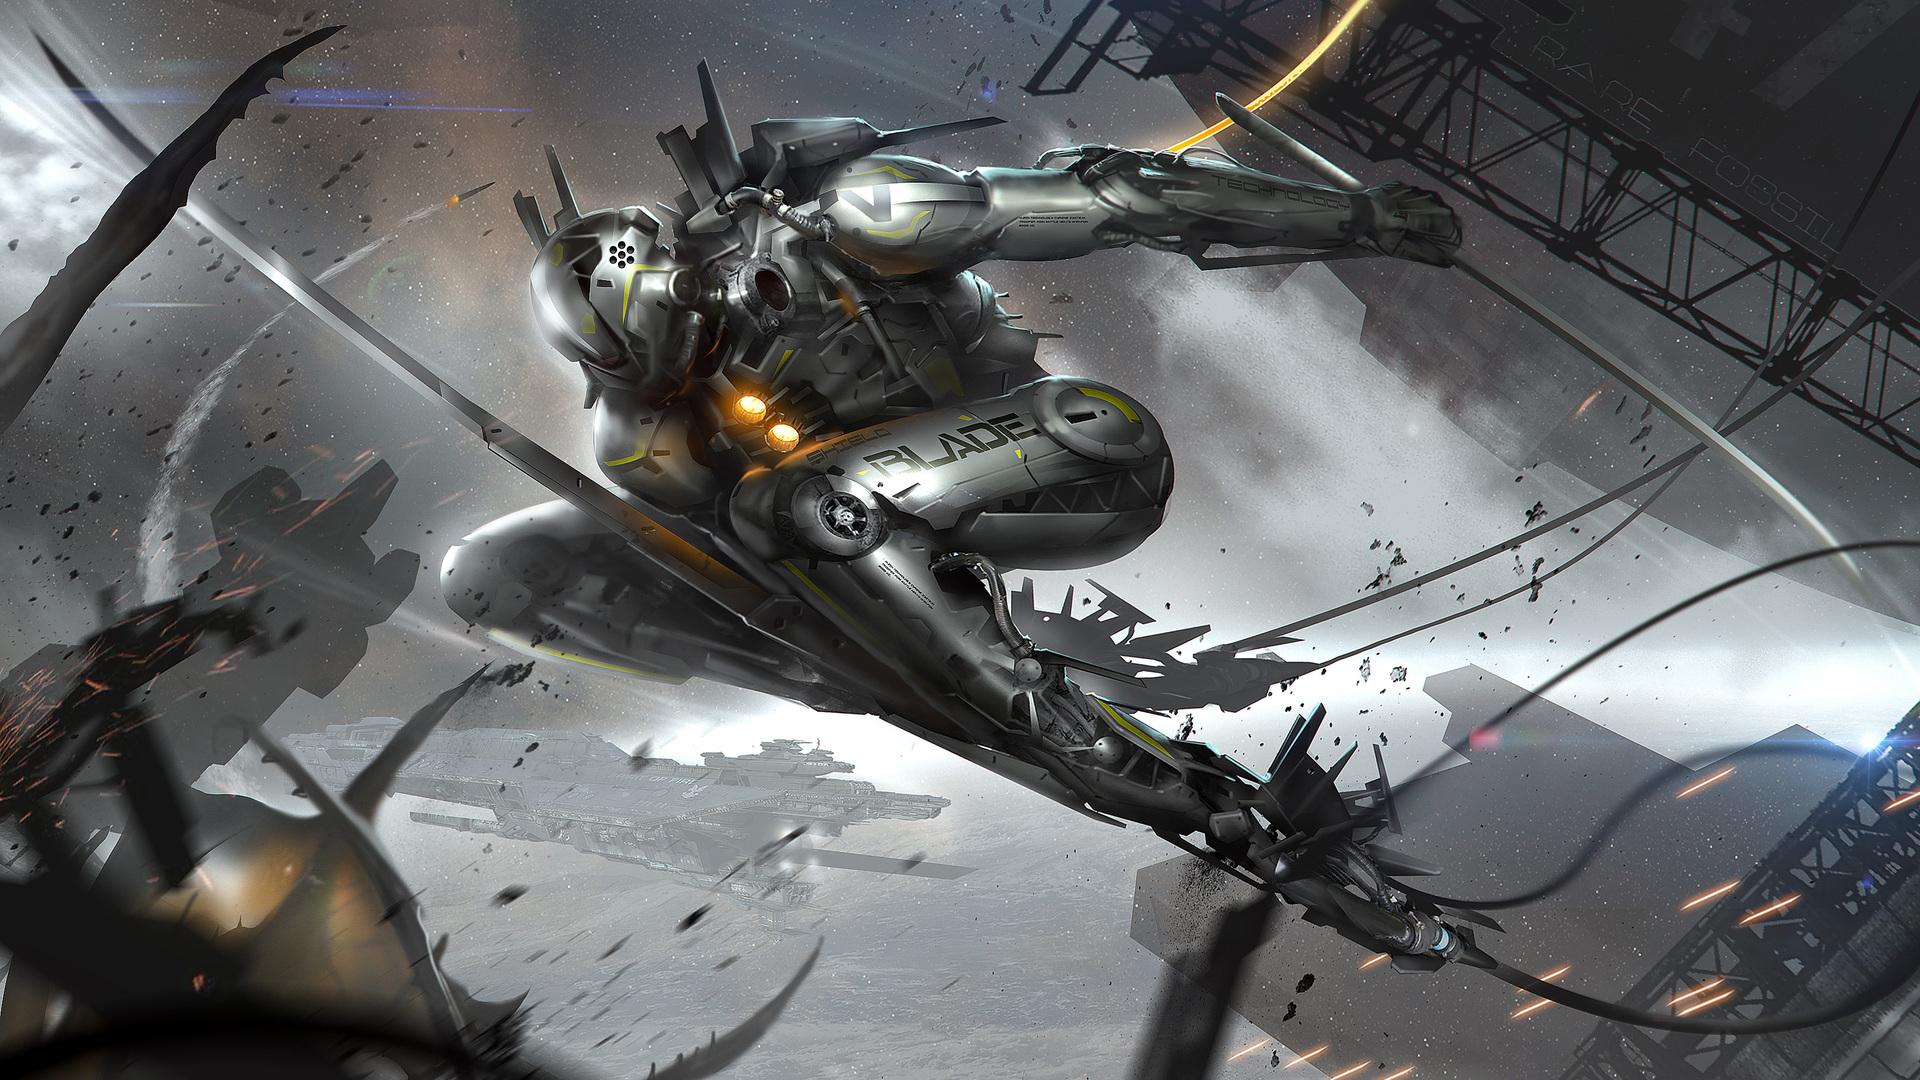 the-blade-concept-robot-humandriod-art-character-design-spaceshi-t6.jpg